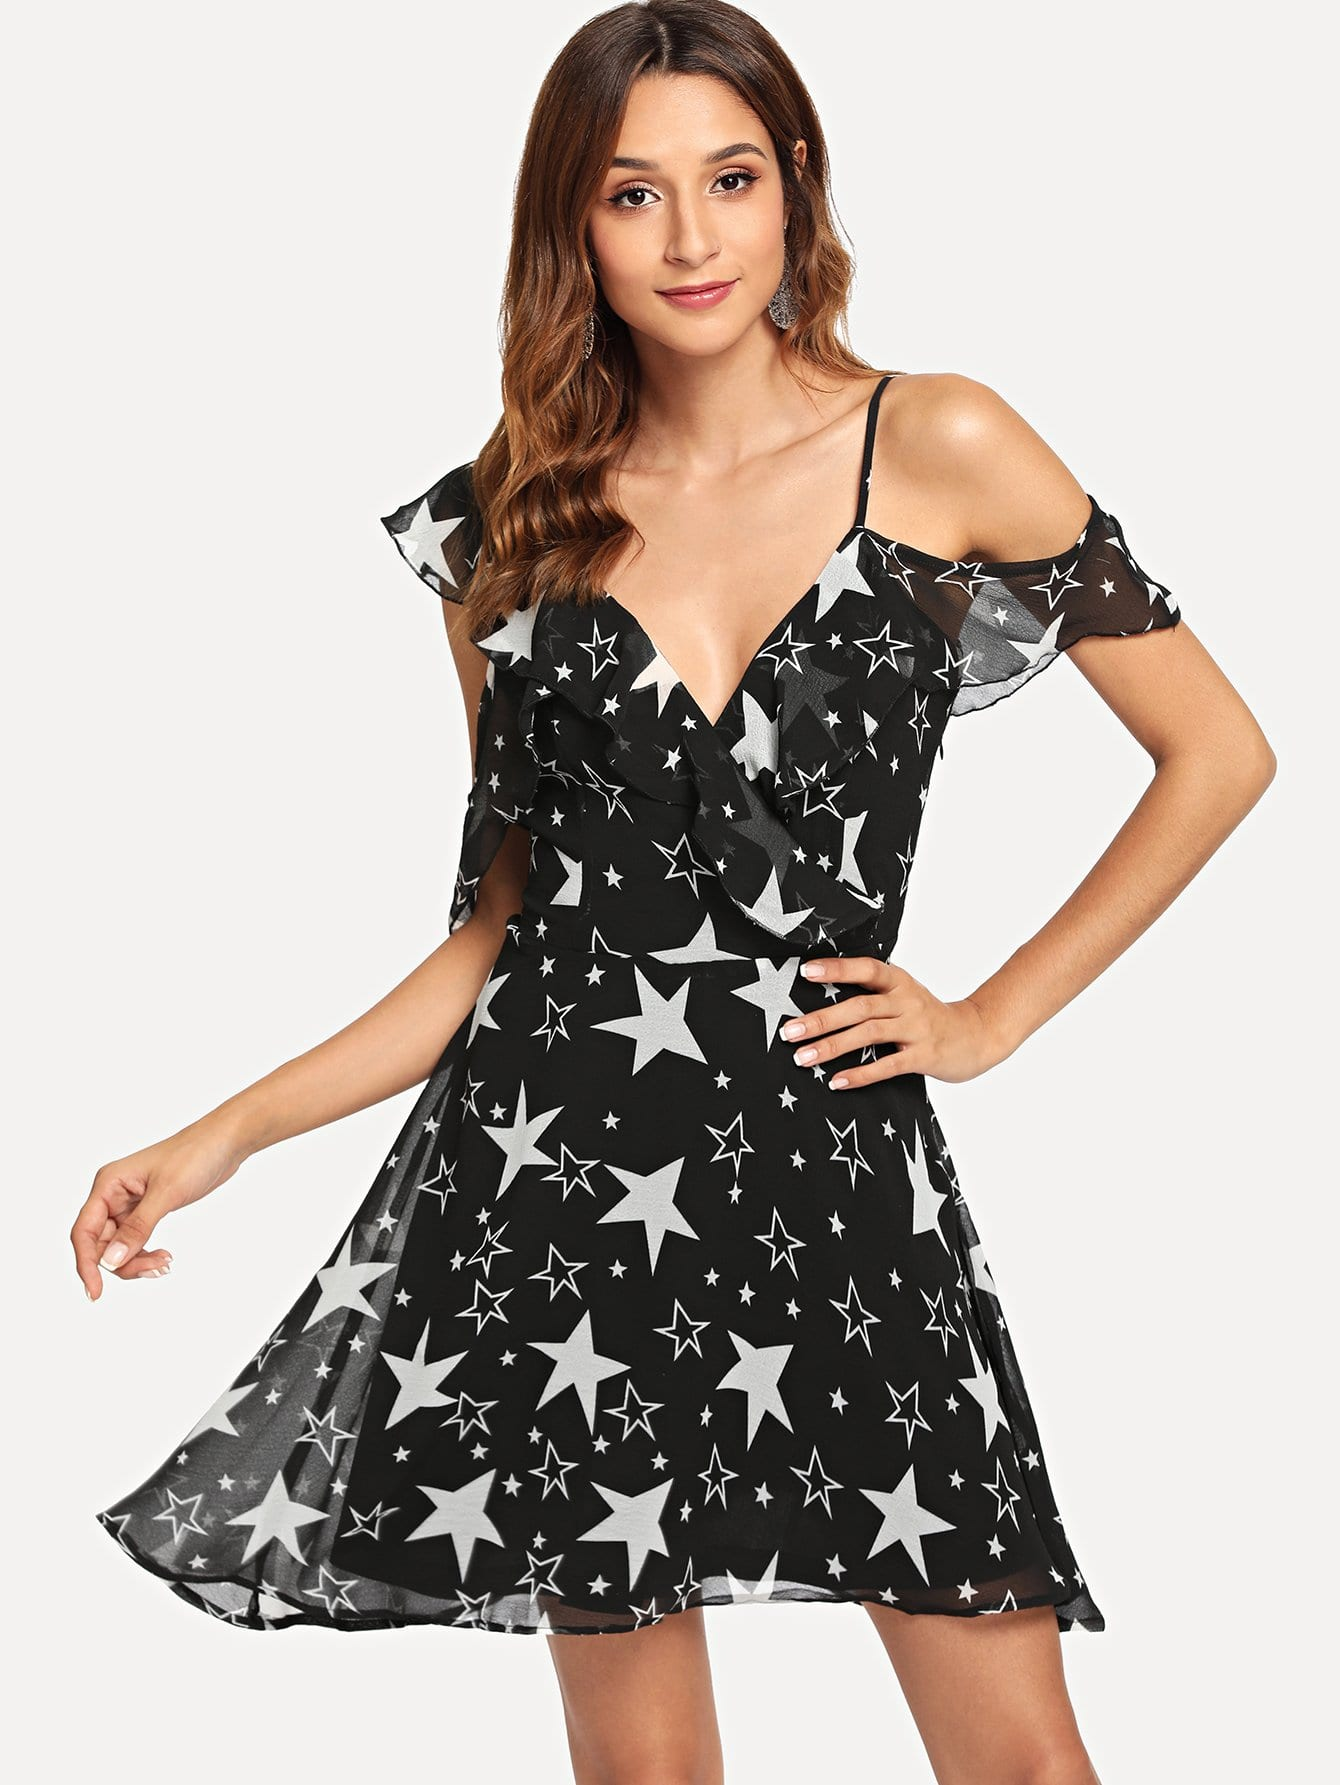 Allover Star Print Асимметричное платье для декольте